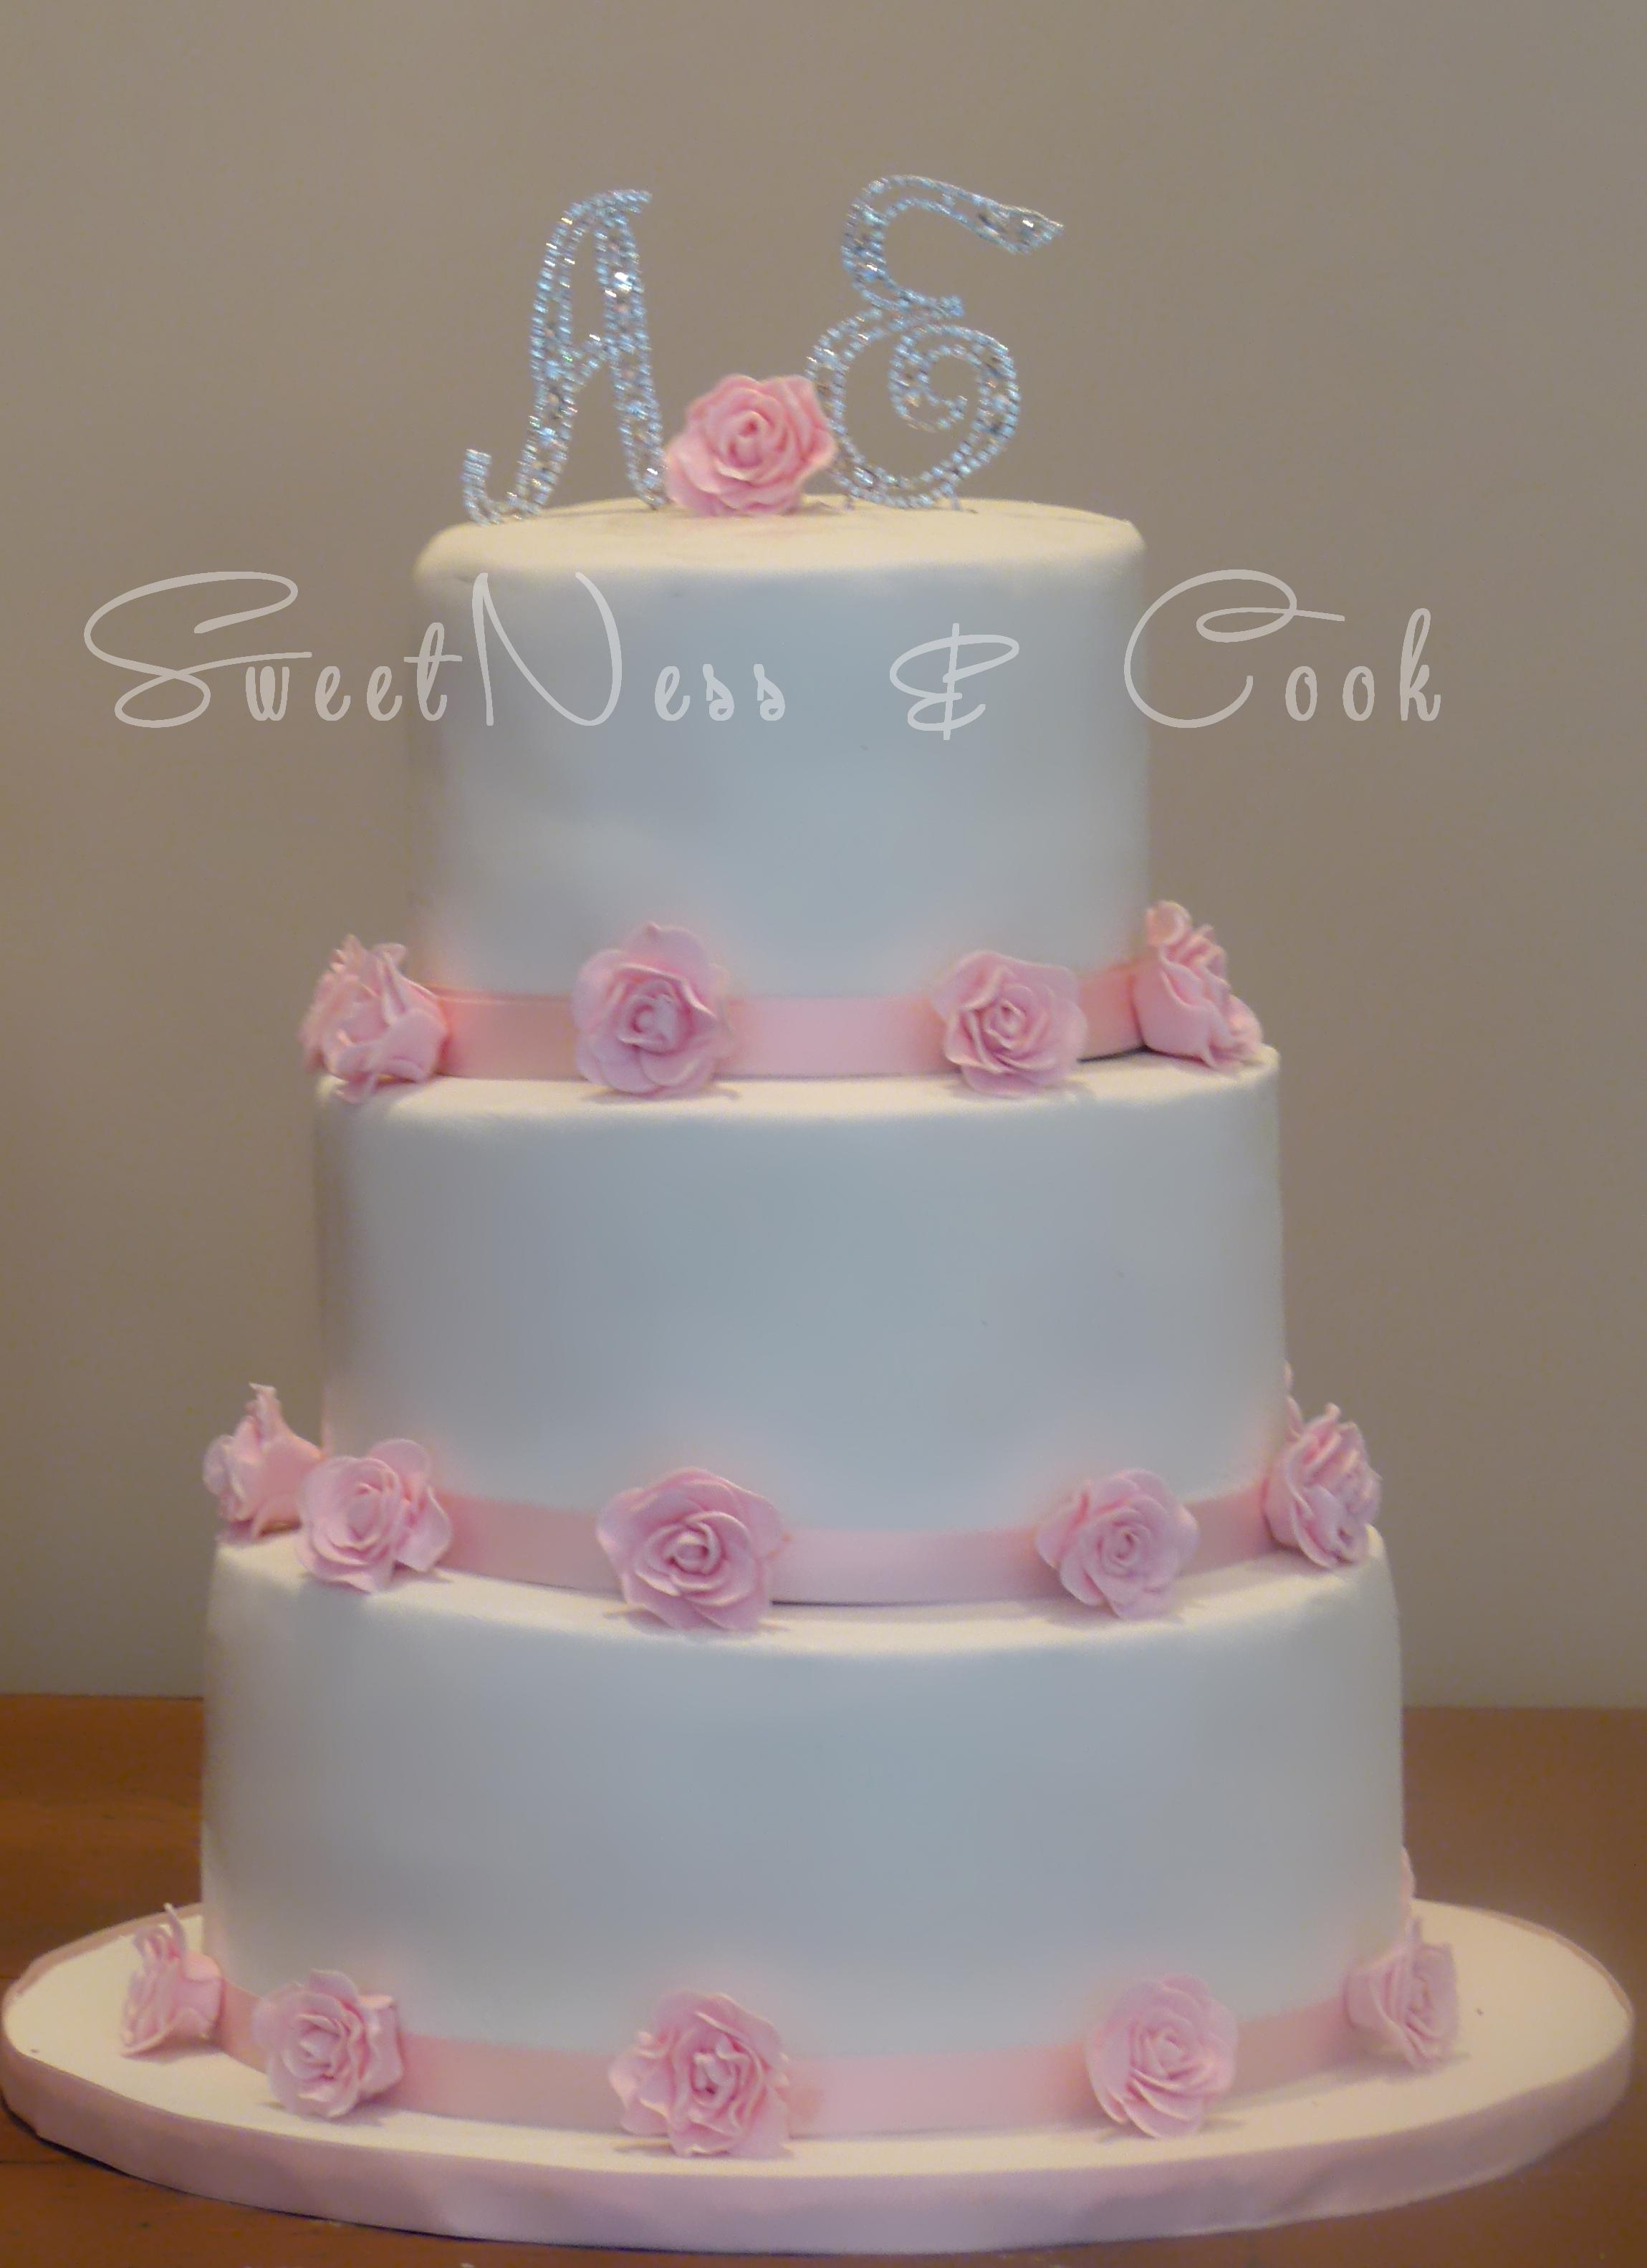 Wedding Cake boutons de roses